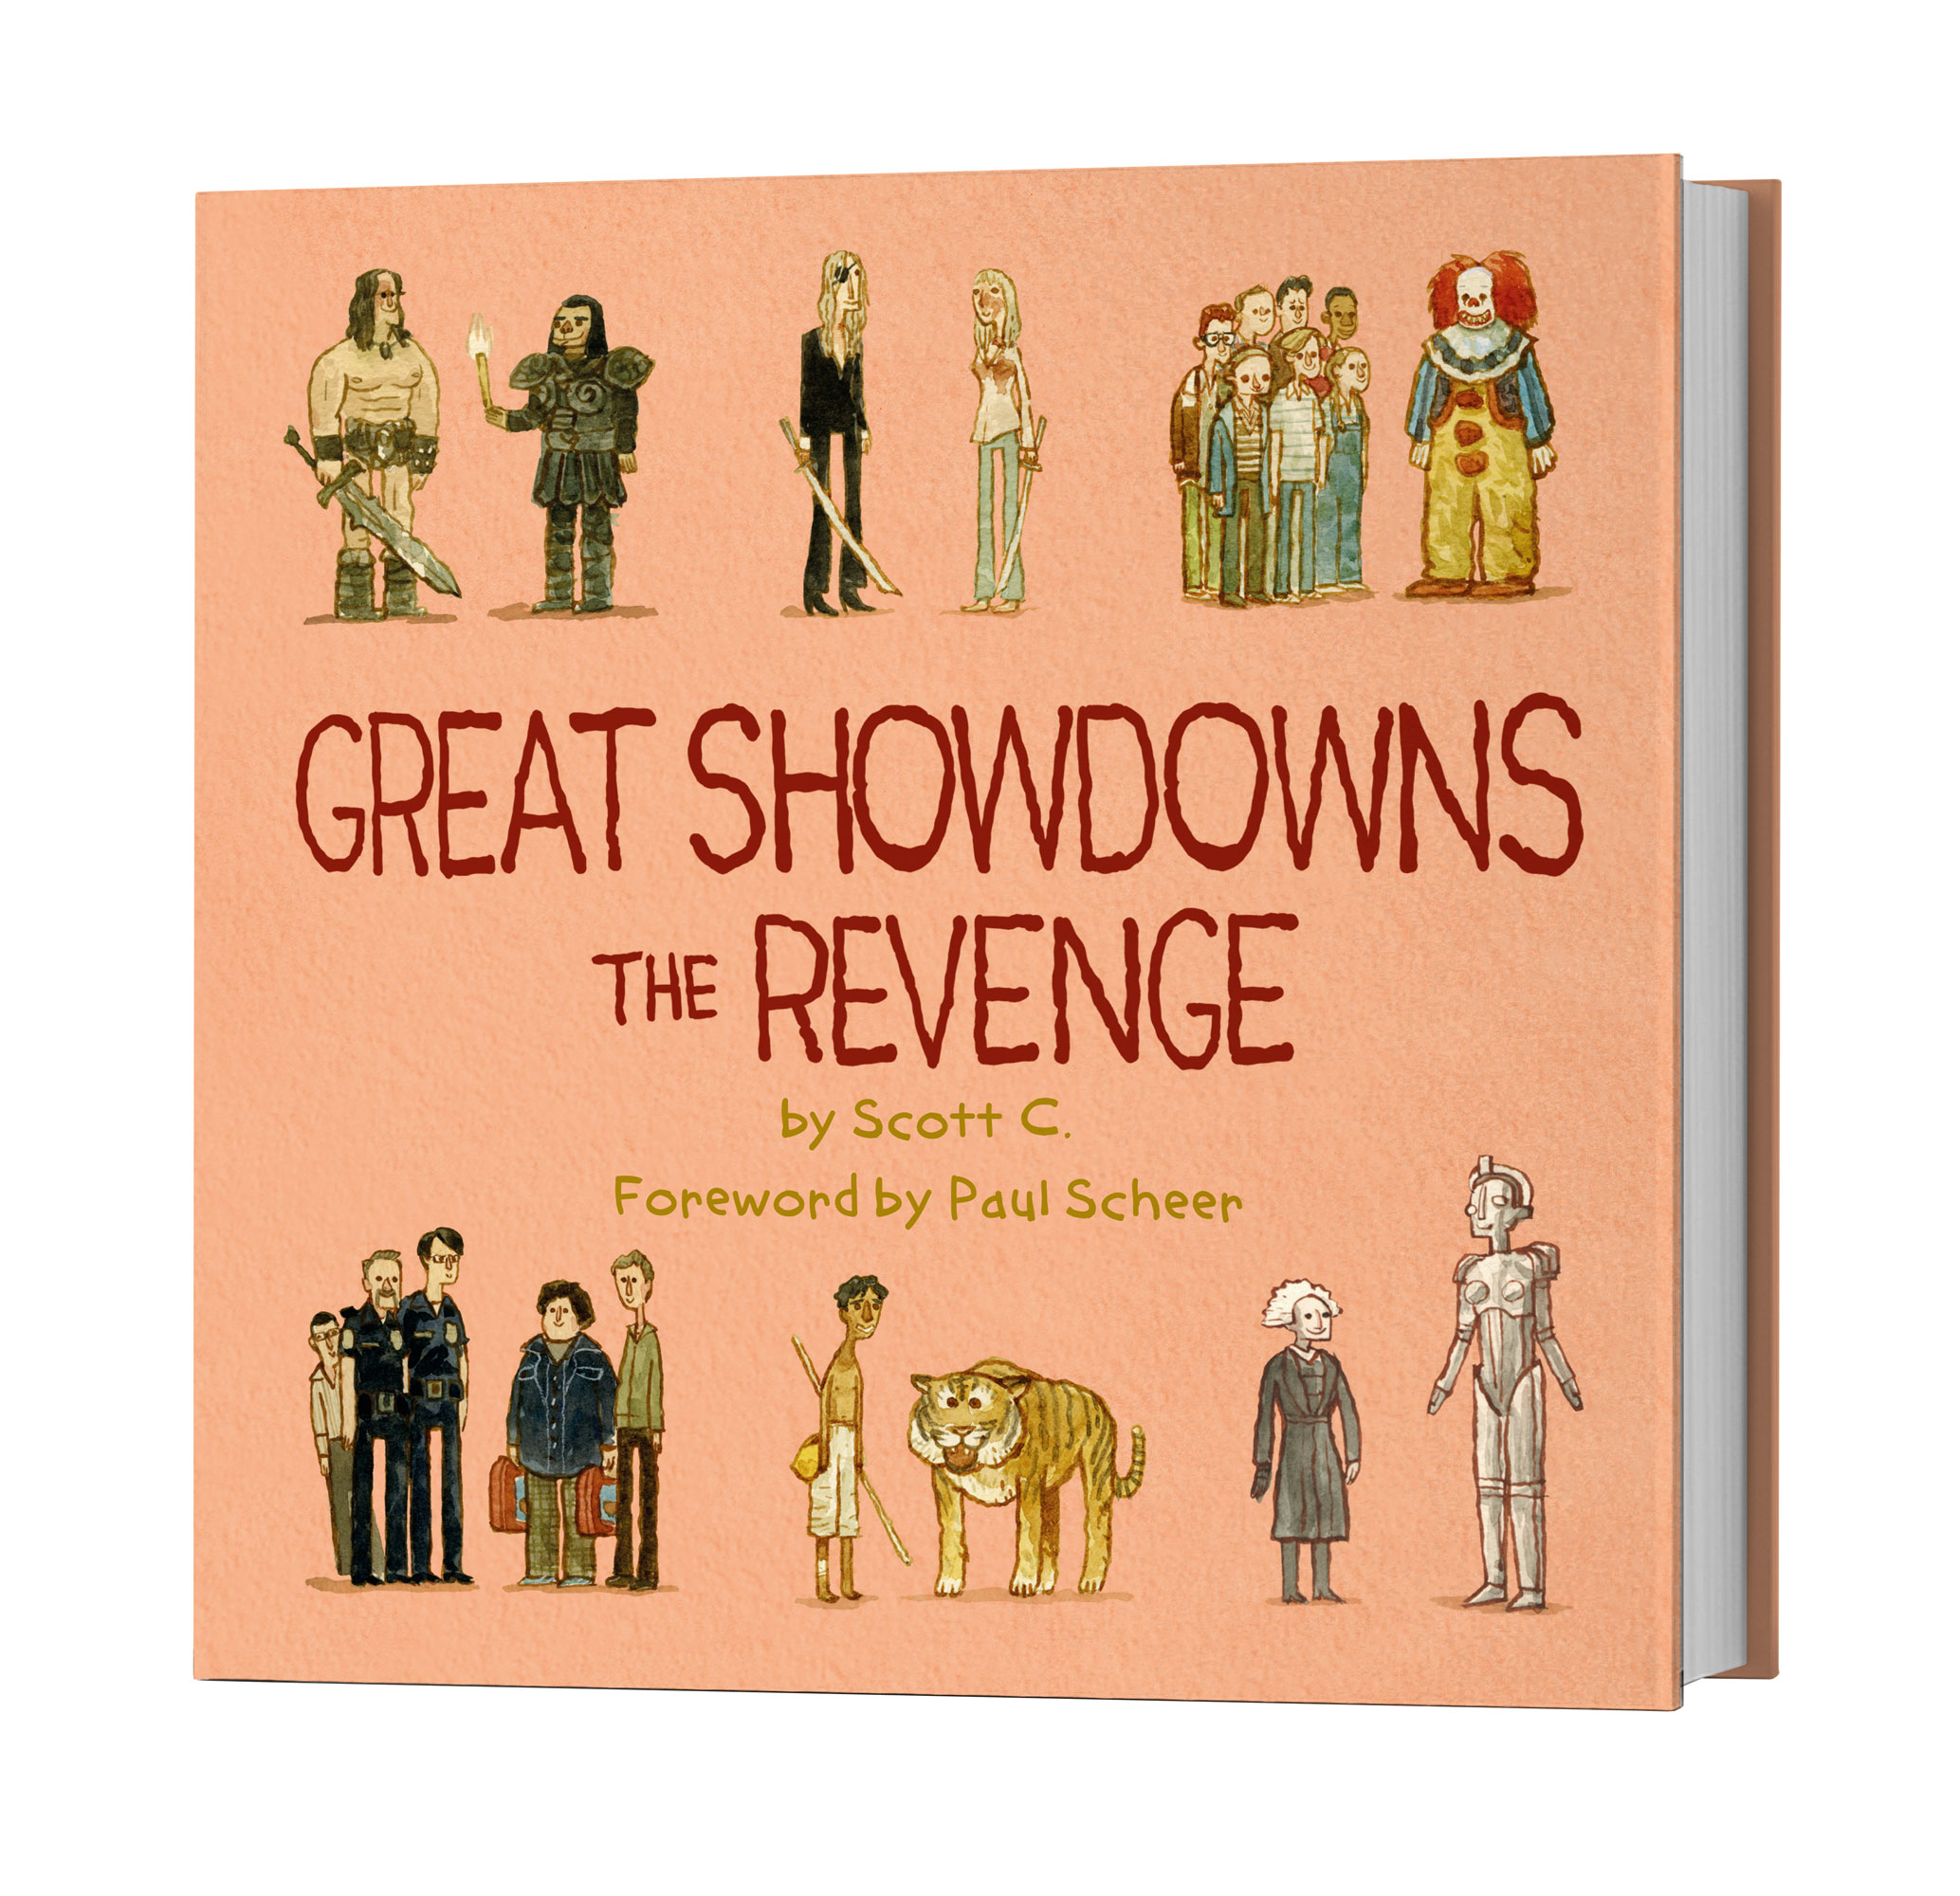 GreatShowdowns_SDCC.jpg